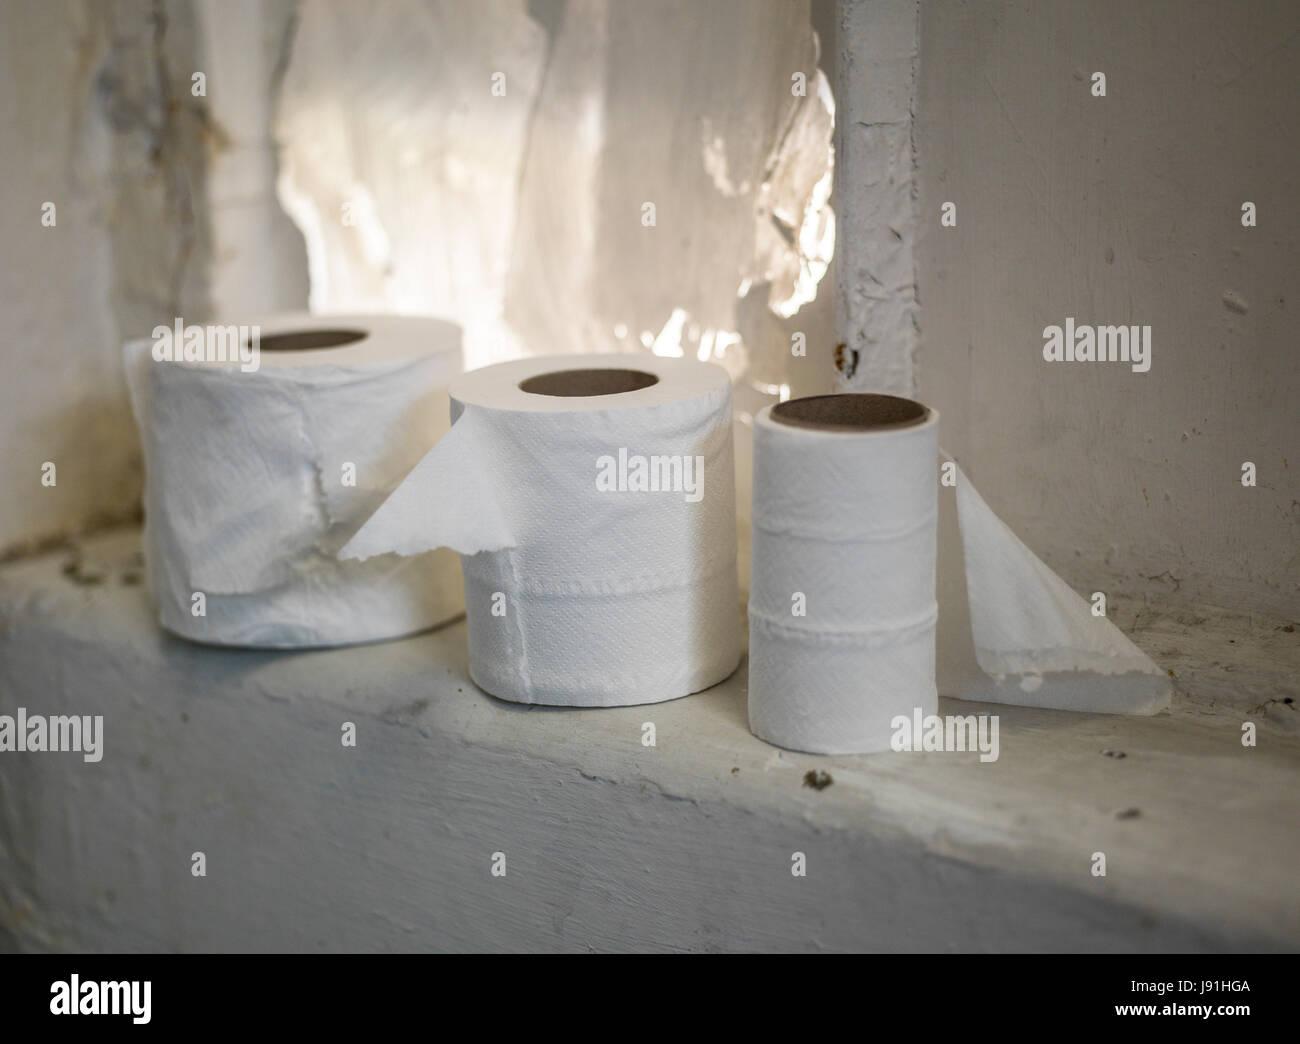 toilet rolls in messy bathroom - Stock Image